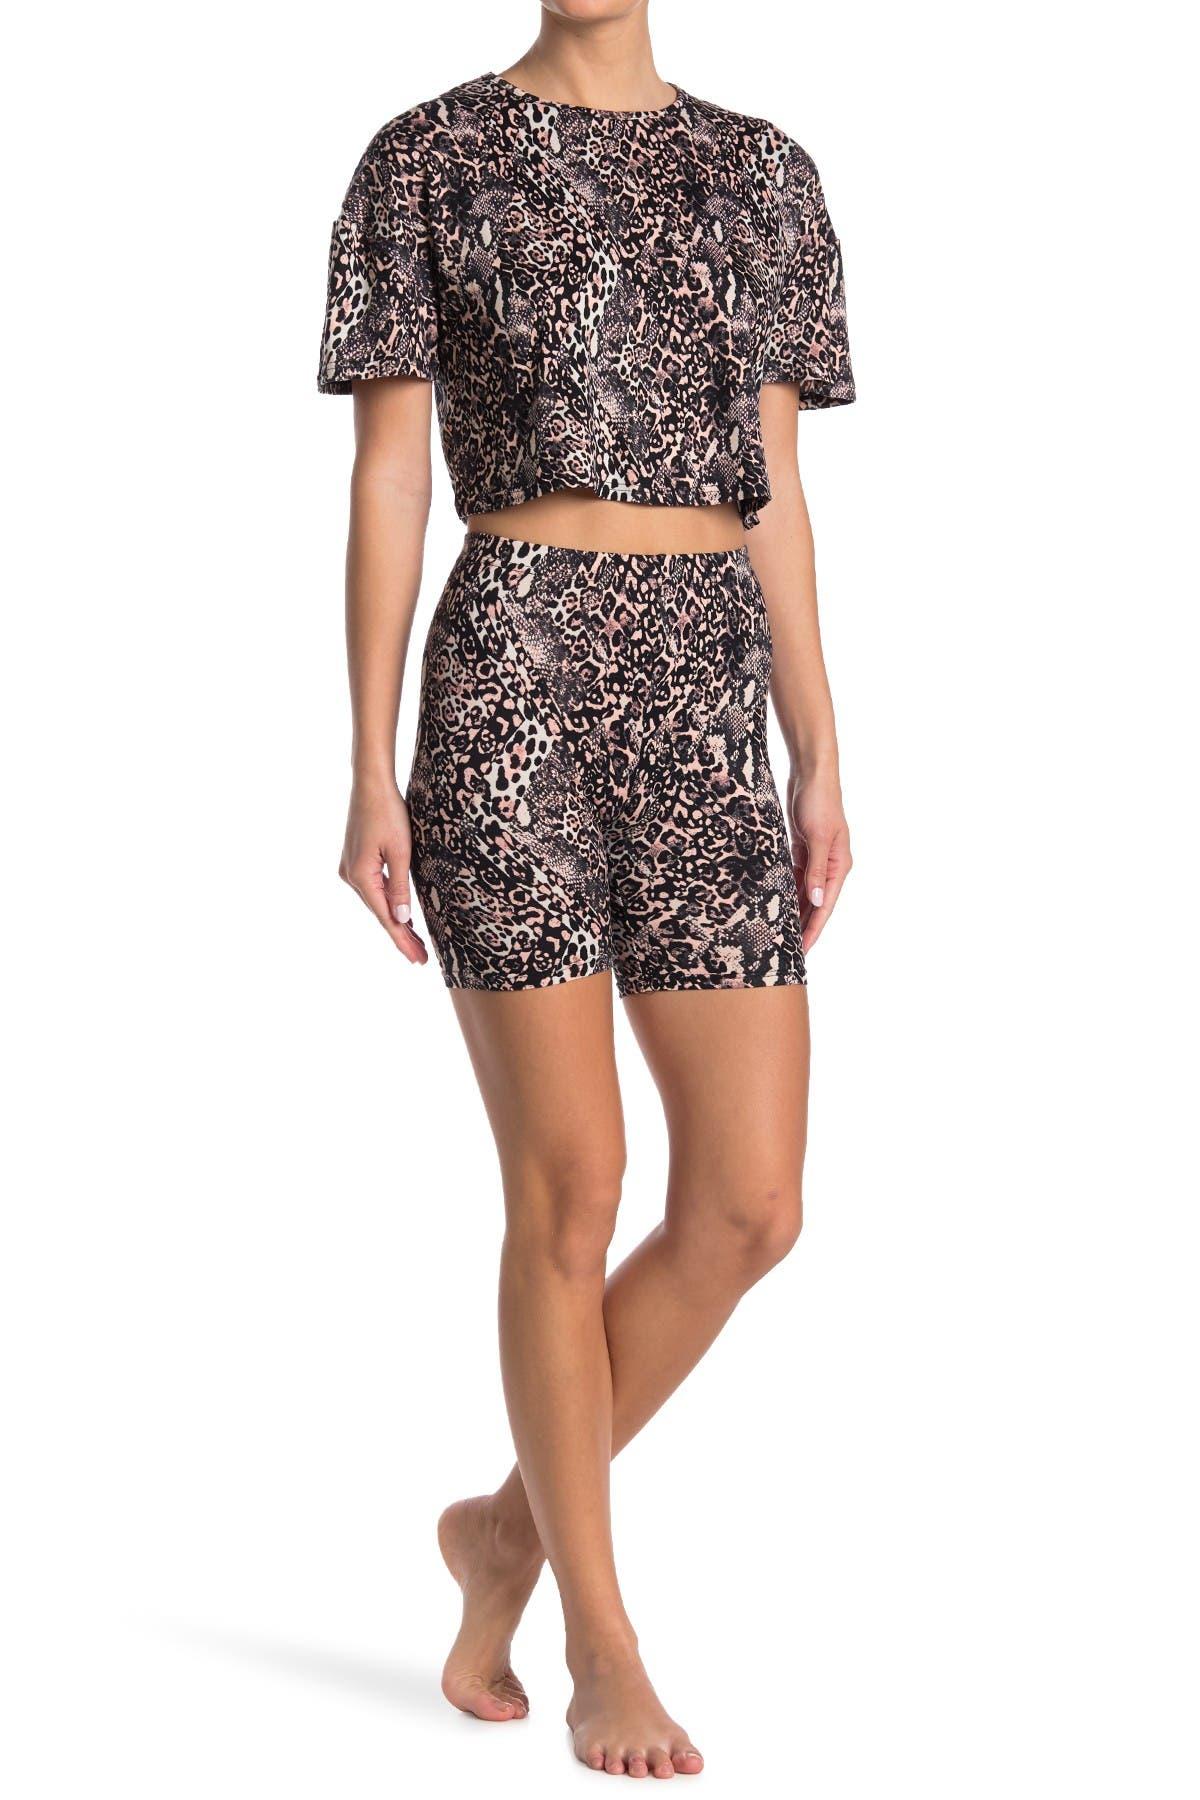 Image of FRENCH AFFAIR Animal Print T-Shirt & Bike Shorts Pajama 2-Piece Set